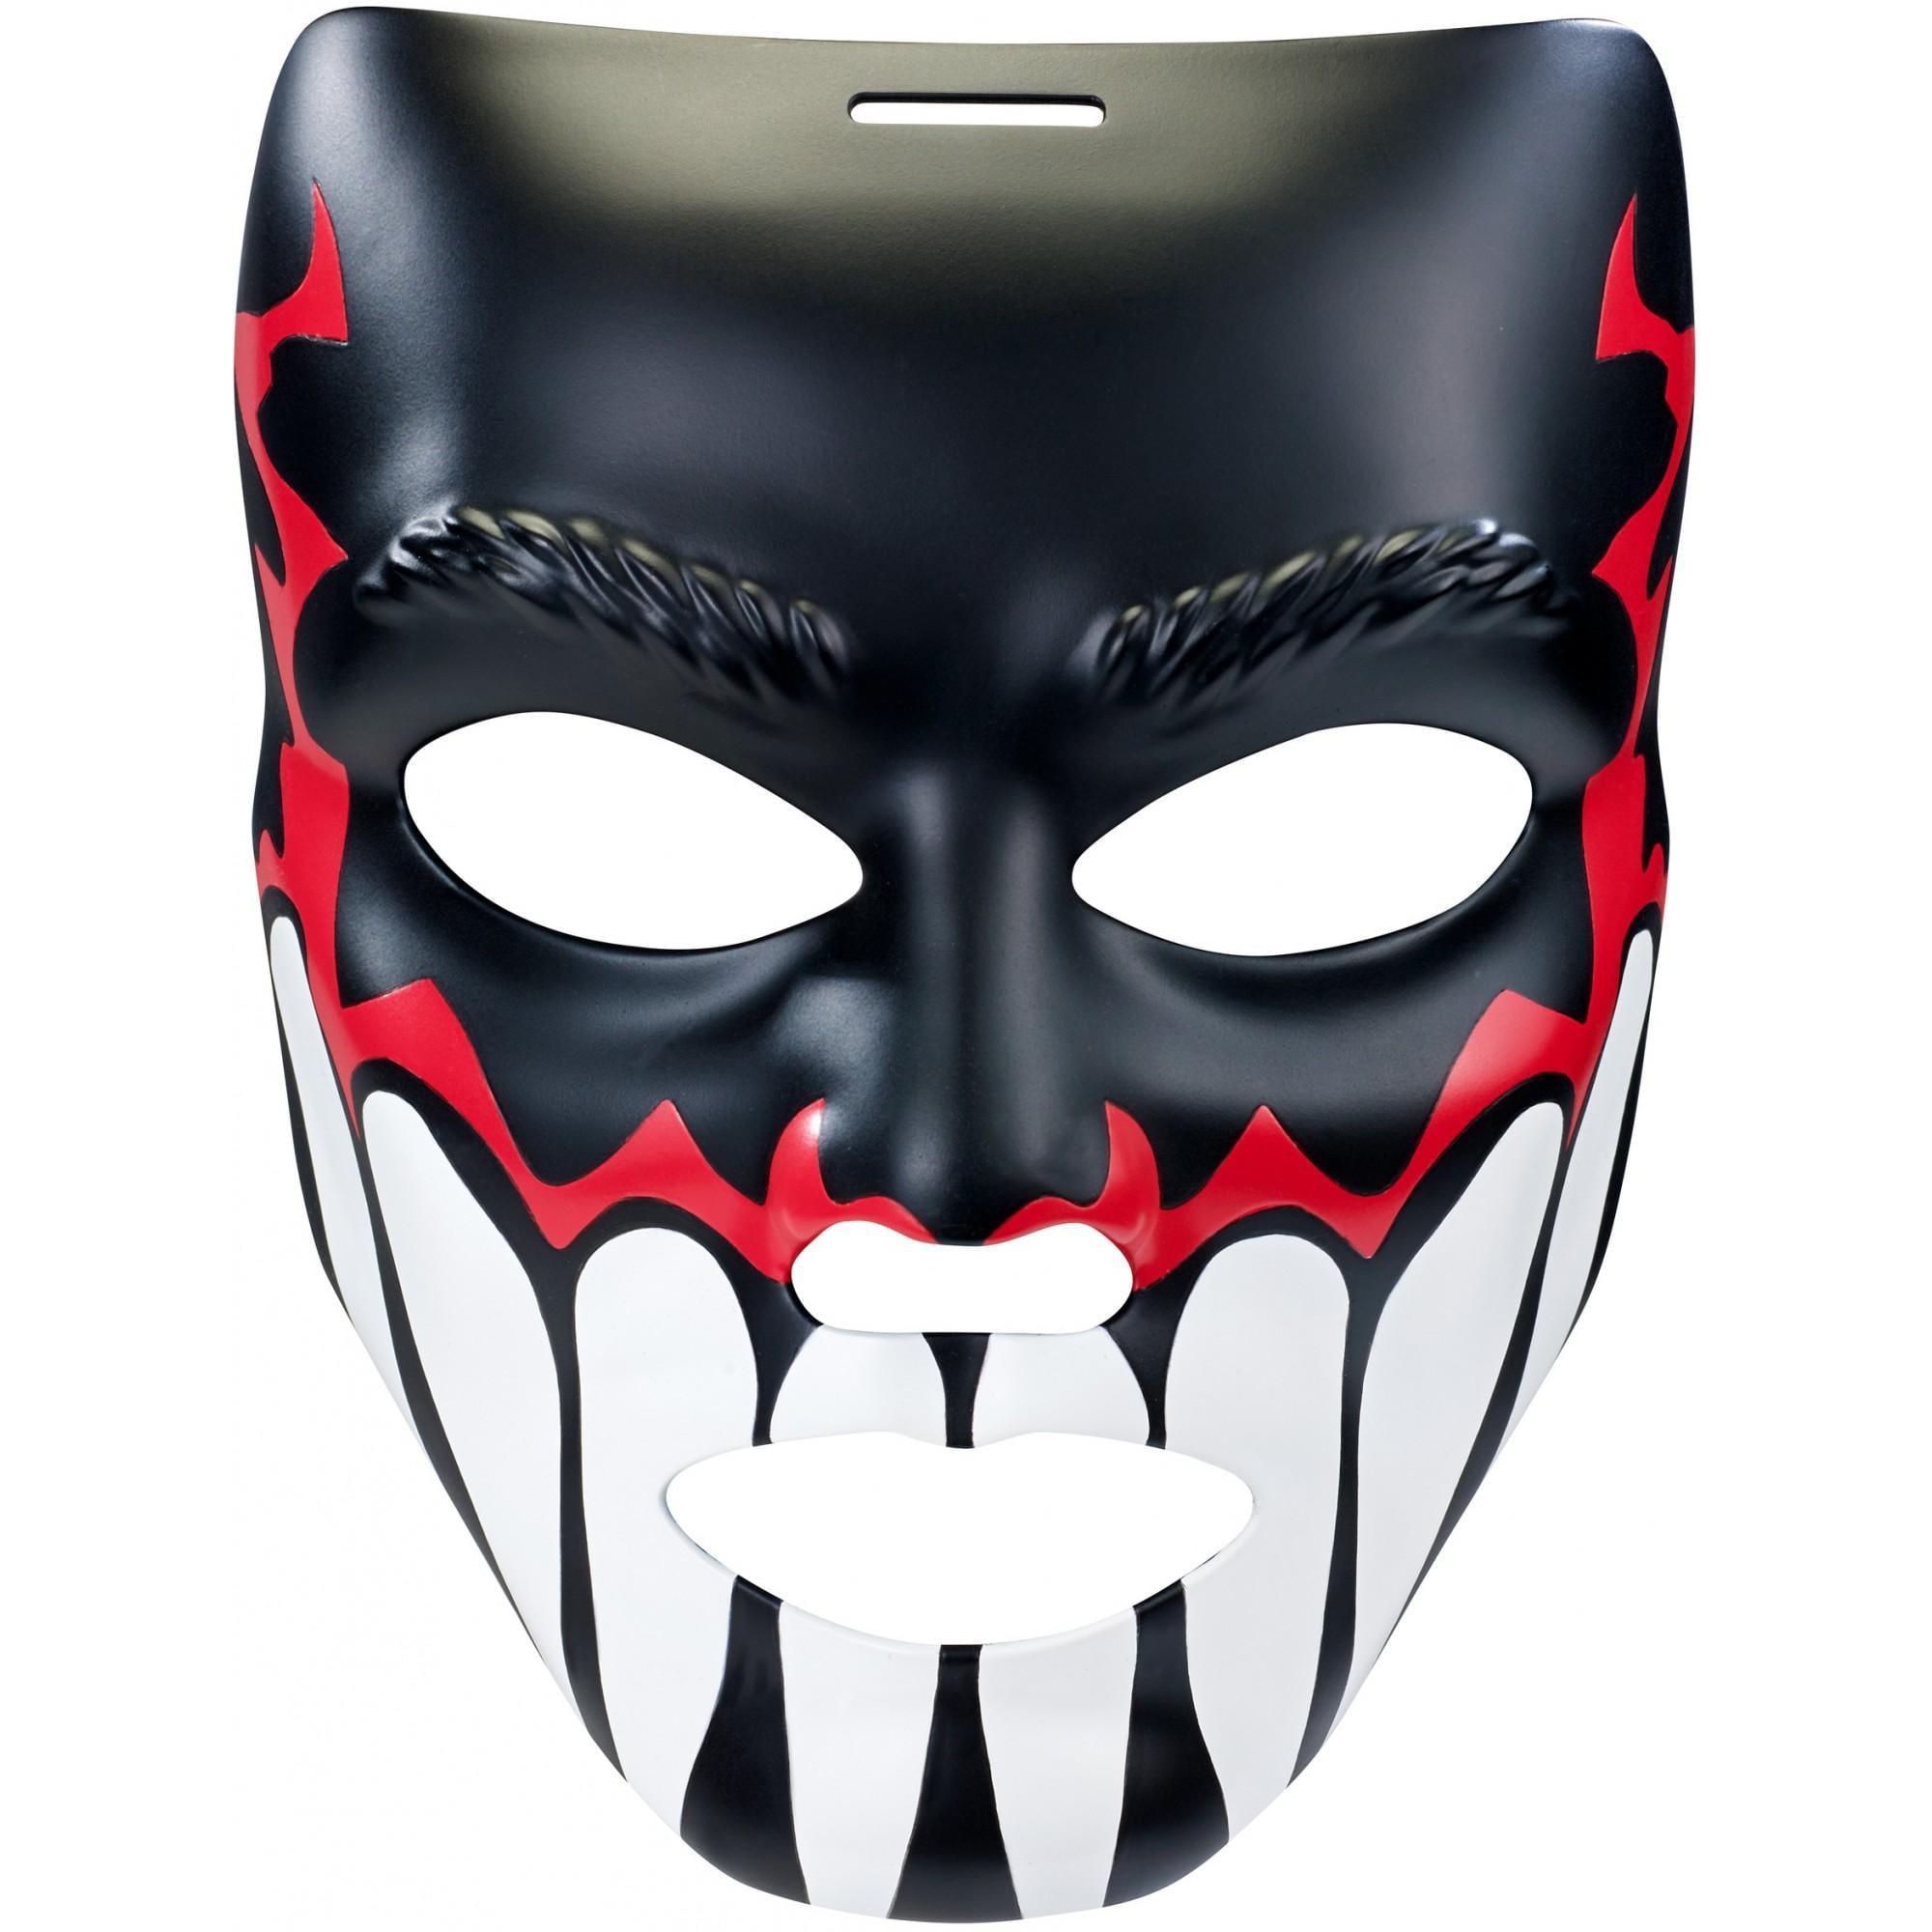 WWE Finn Balor Mask by Mattel